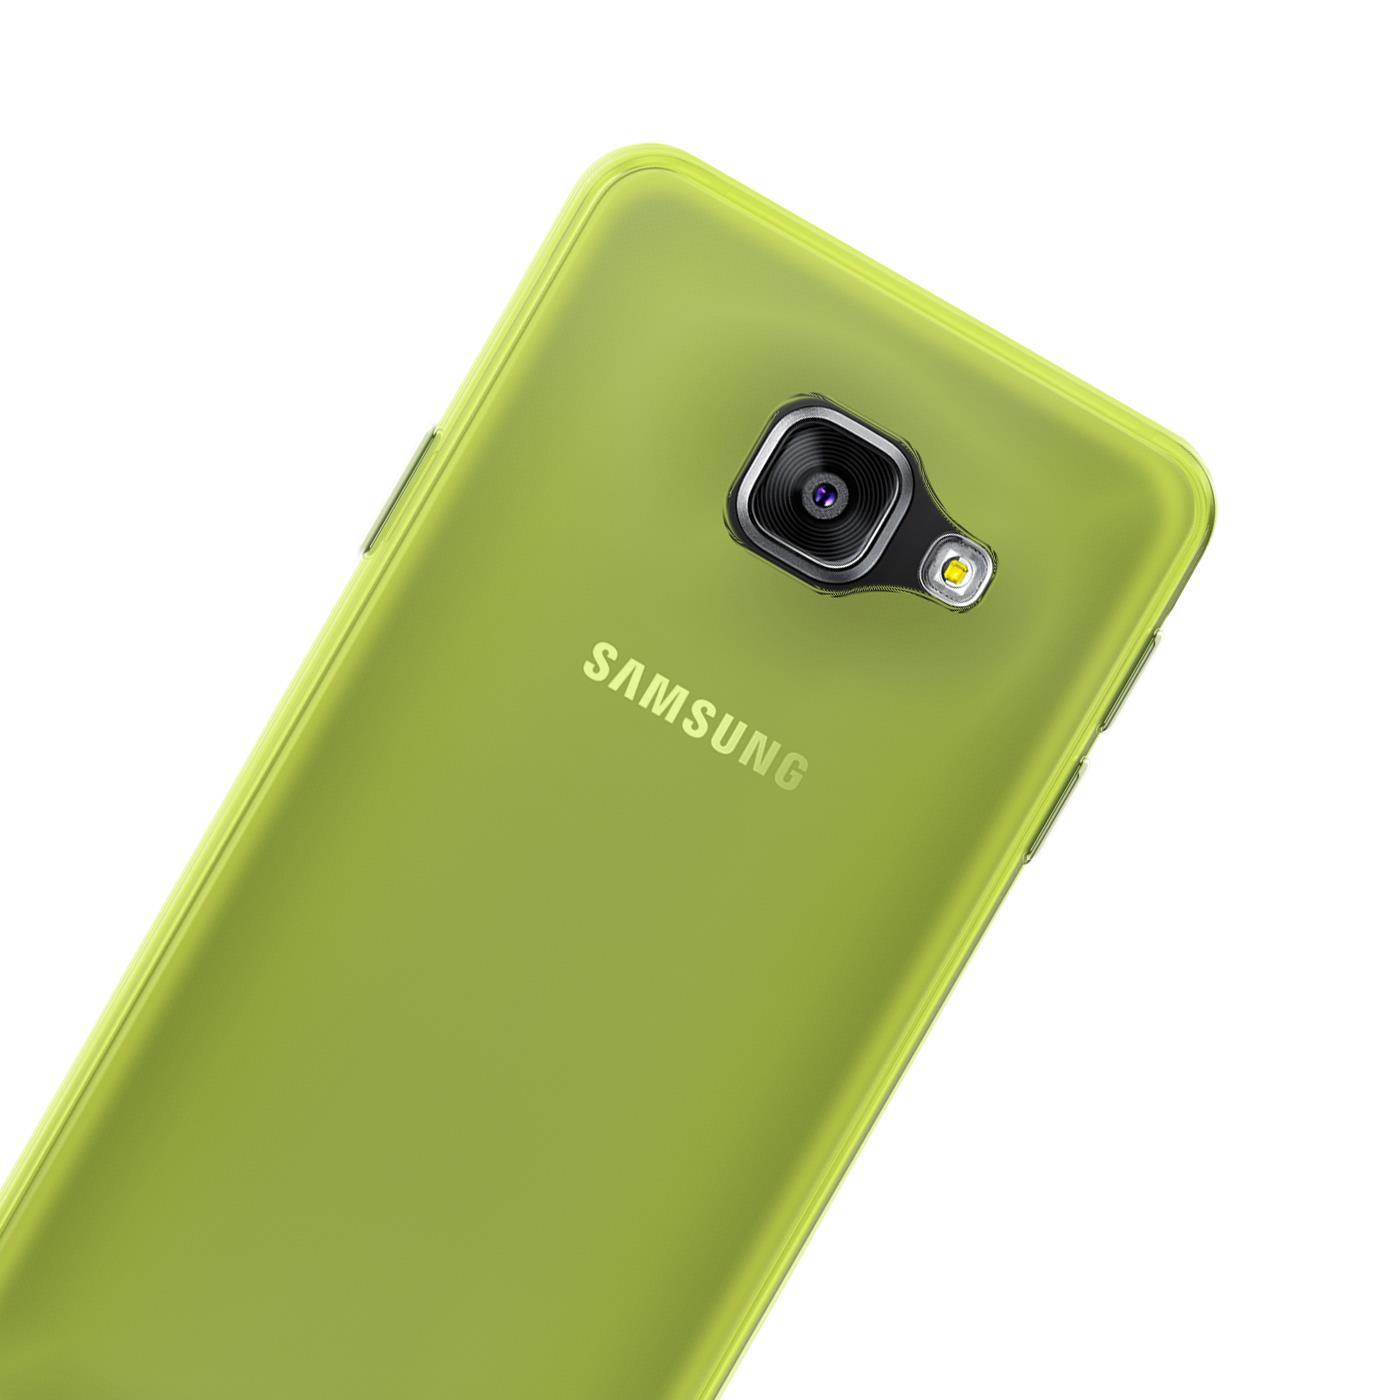 Samsung-Galaxy-a3-2016-Thin-Silikon-Klar-Case-Cover-Ultra-Slim-Stossfeste-Gel Indexbild 14